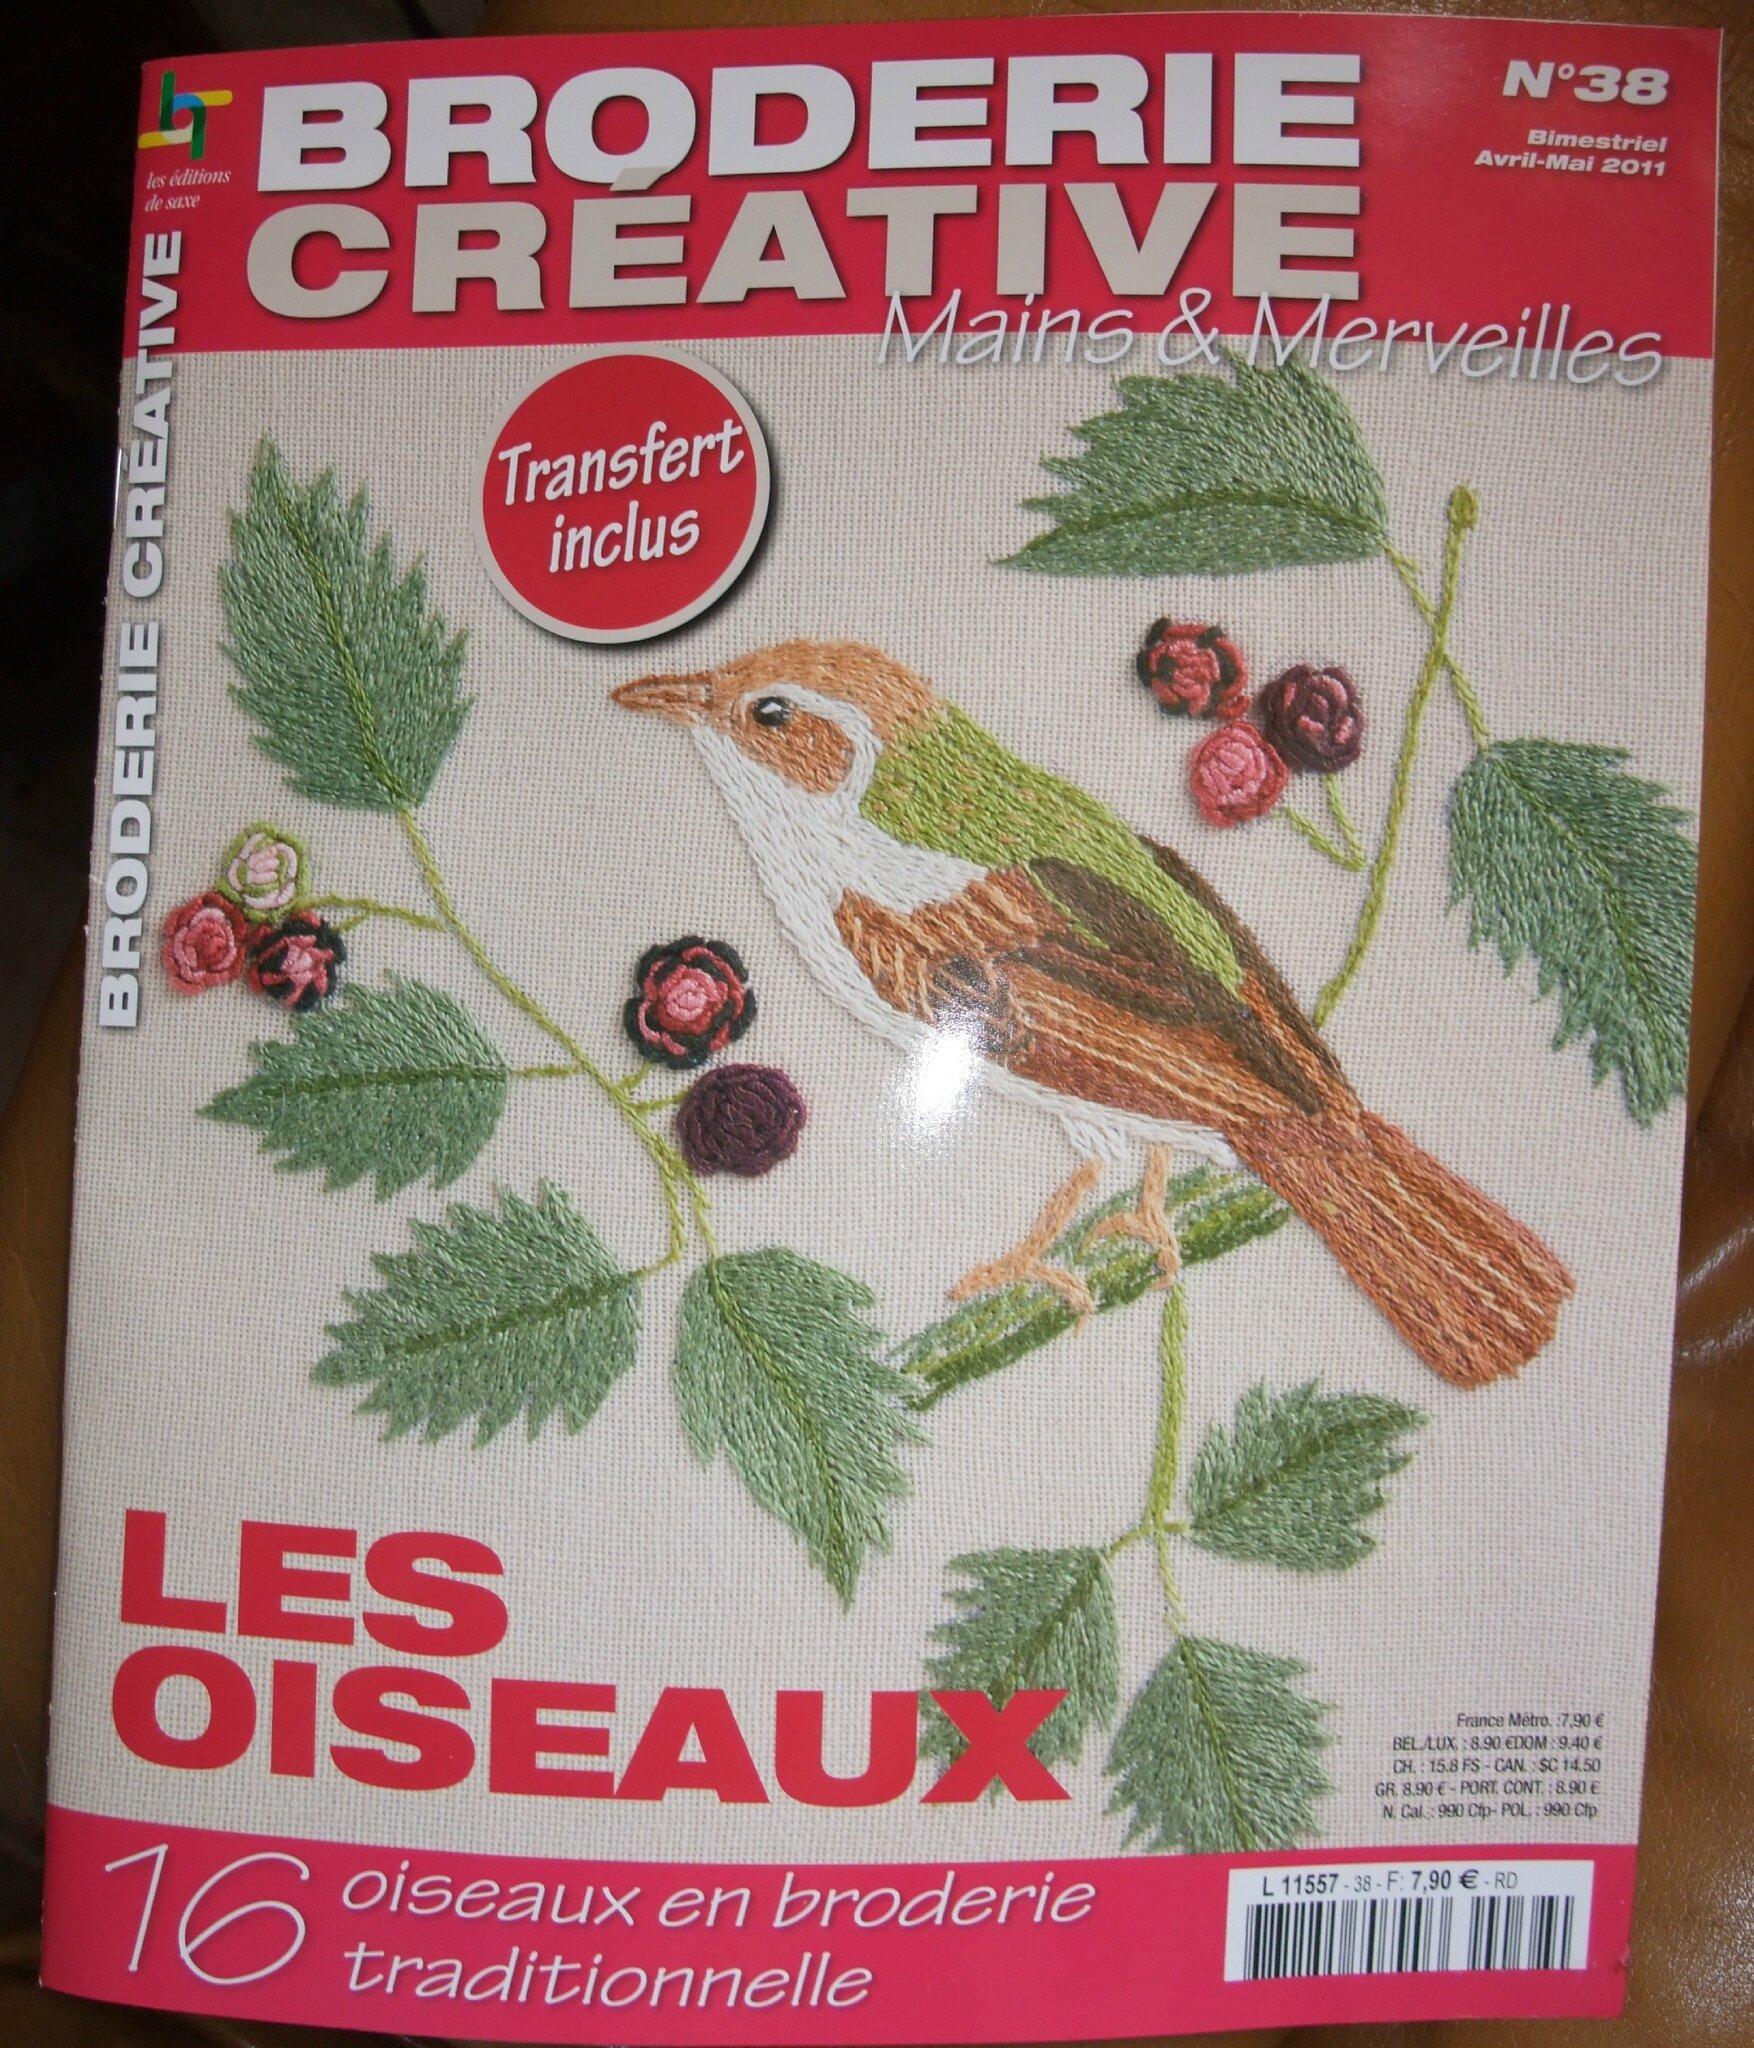 broderie creative-oiseaux